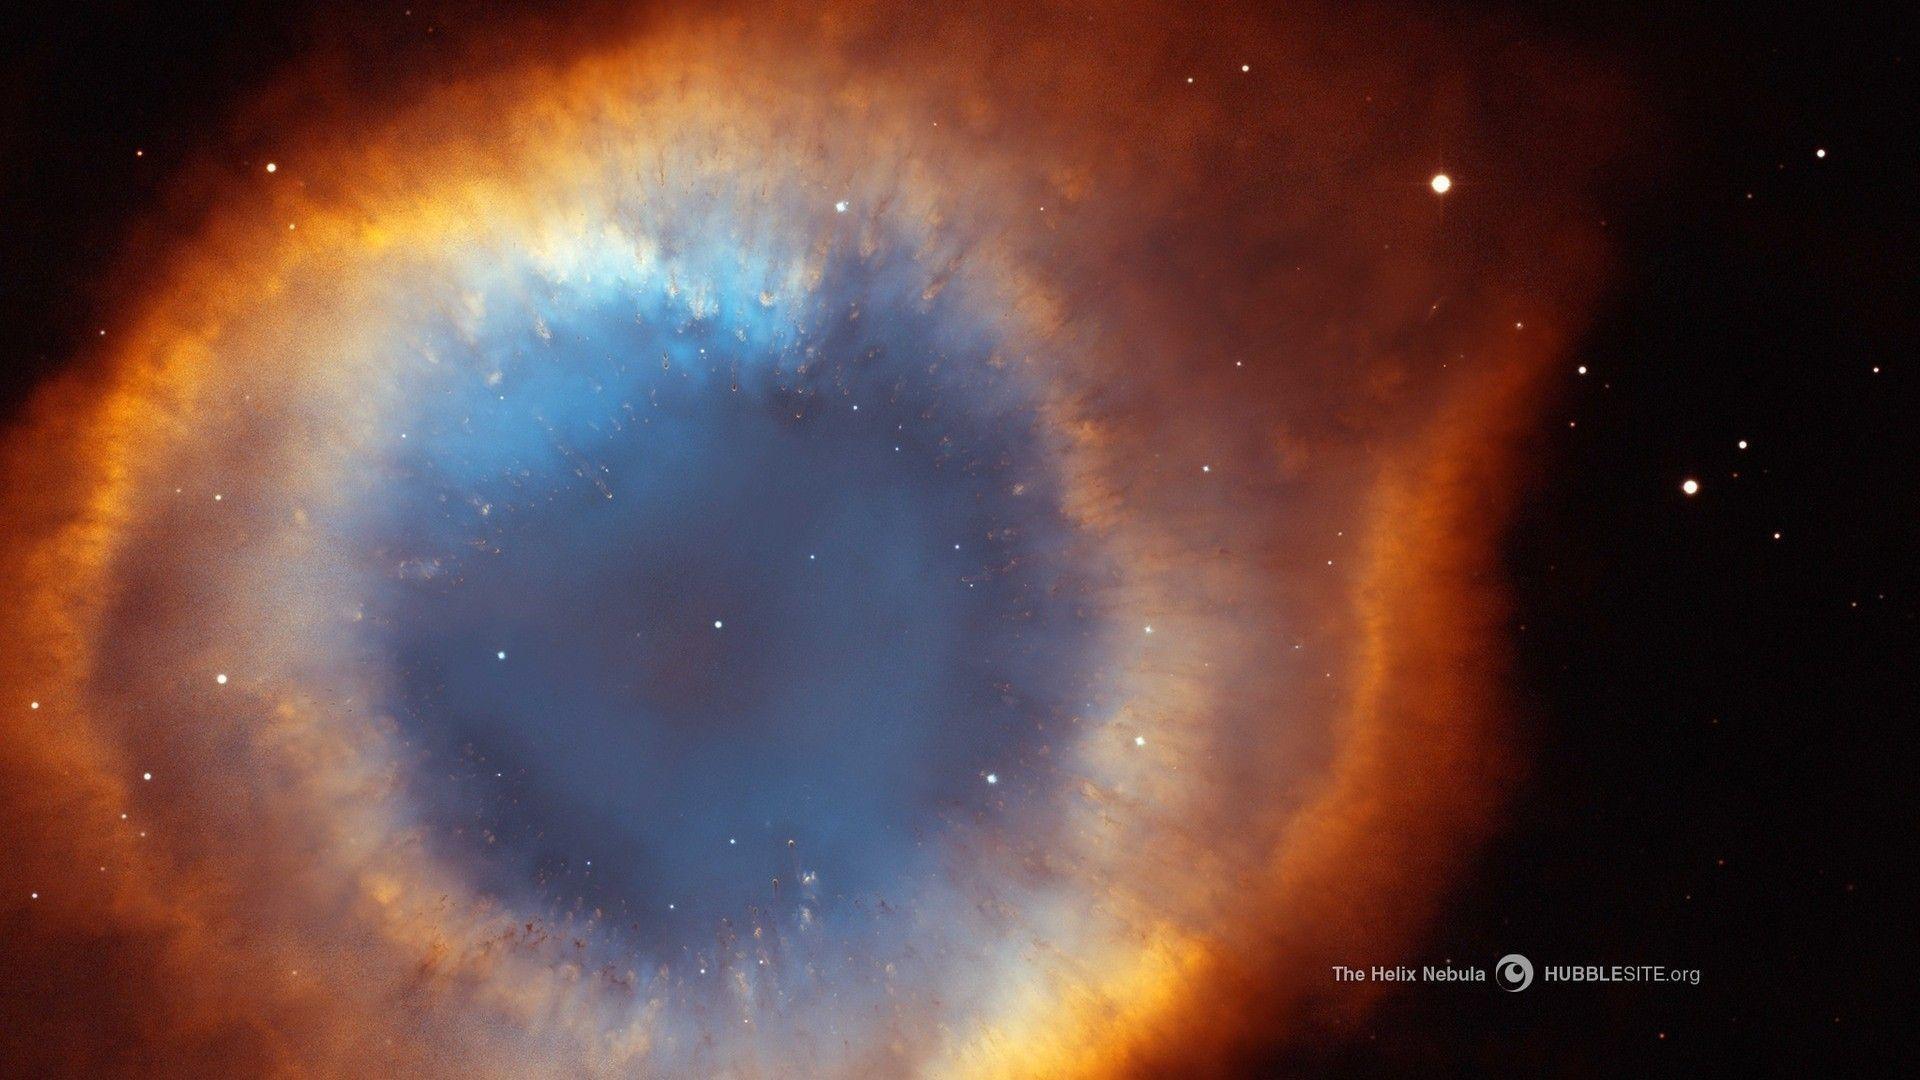 Space Wallpaper Hubble Widescreen 2 HD Wallpapers | lzamgs.